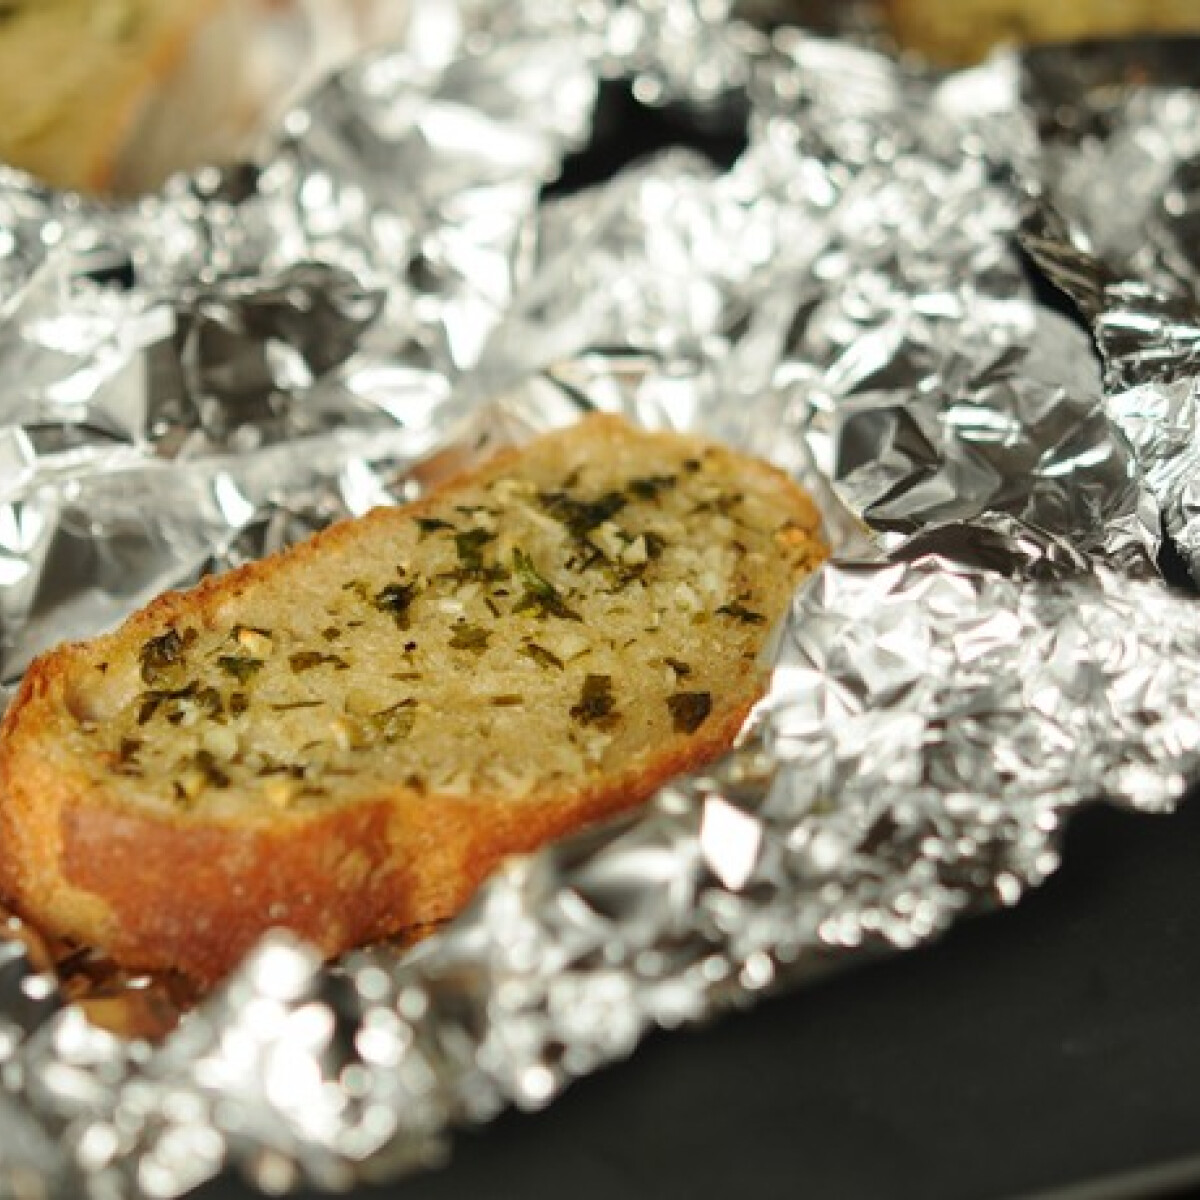 Ezen a képen: Garlic bread